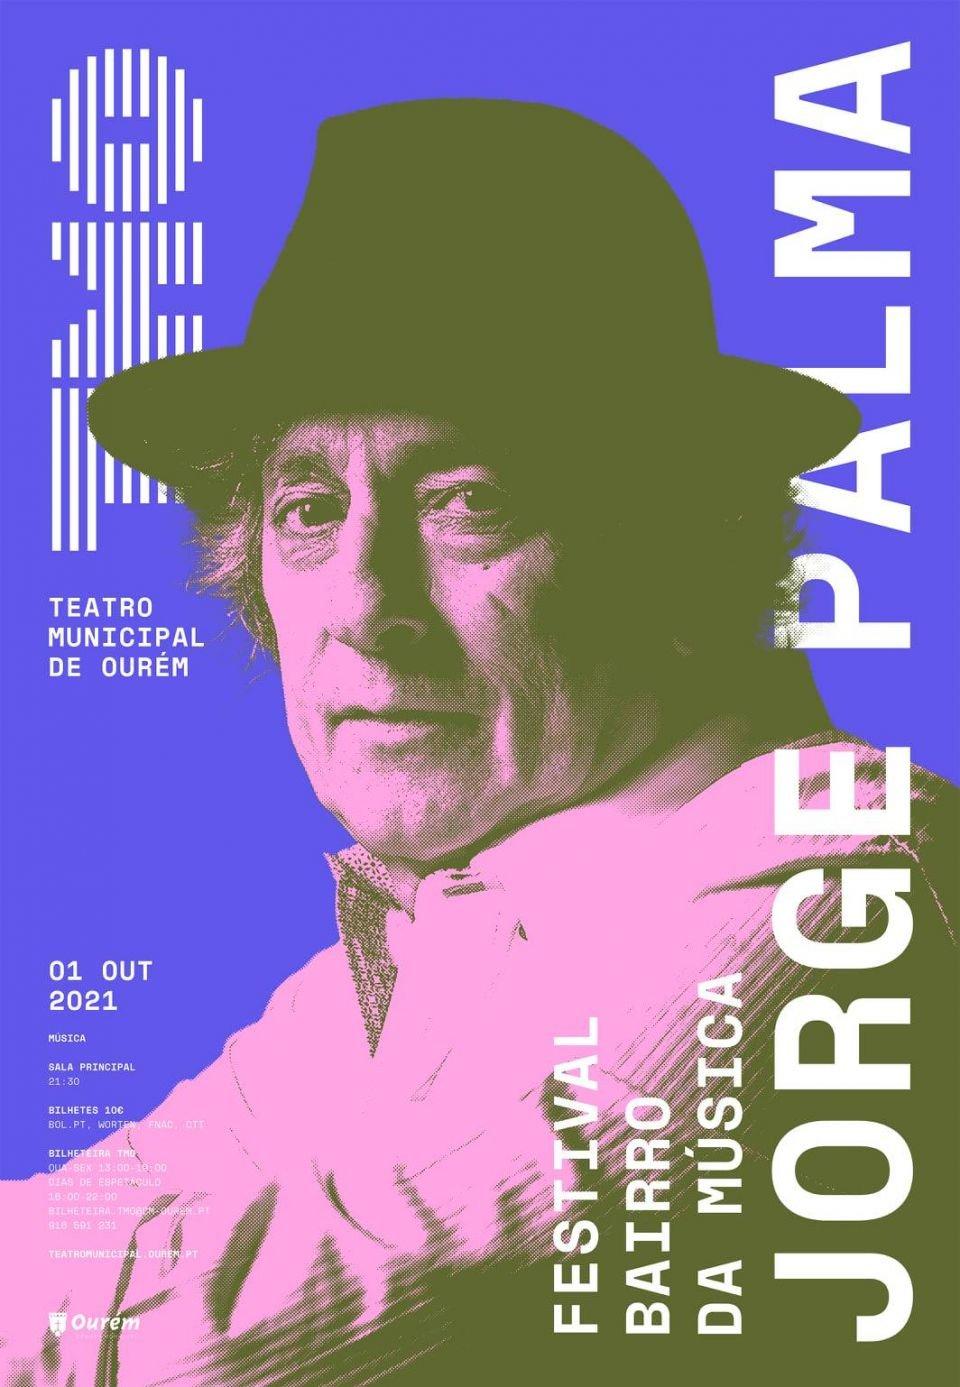 CONCERTO 'JORGE PALMA'